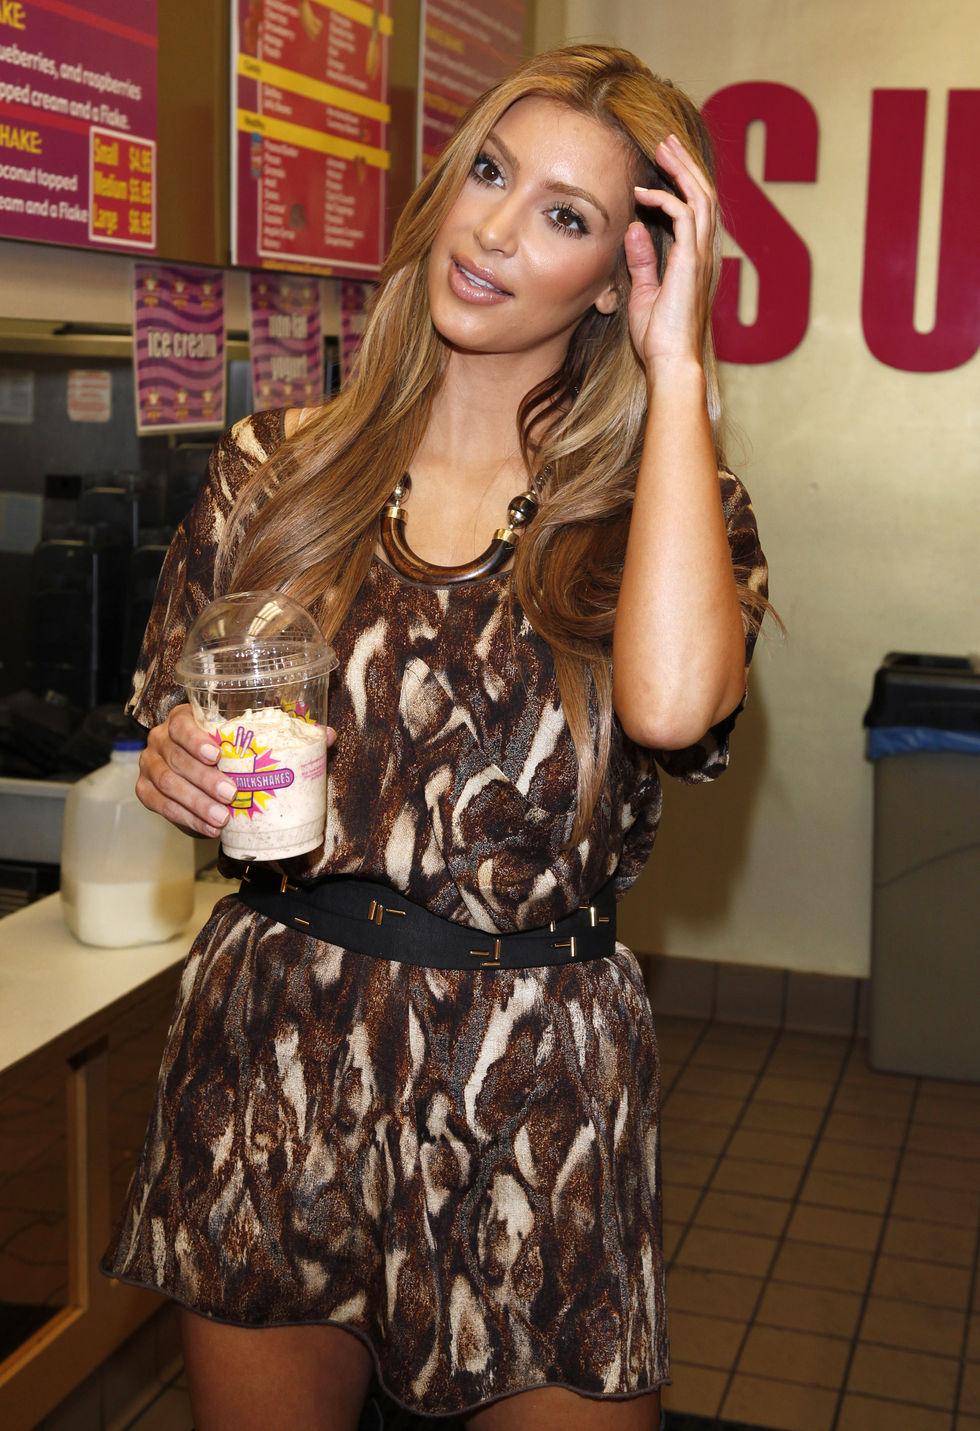 kim-and-kourtney-kardashian-at-millions-of-milkshakes-in-los-angeles-05